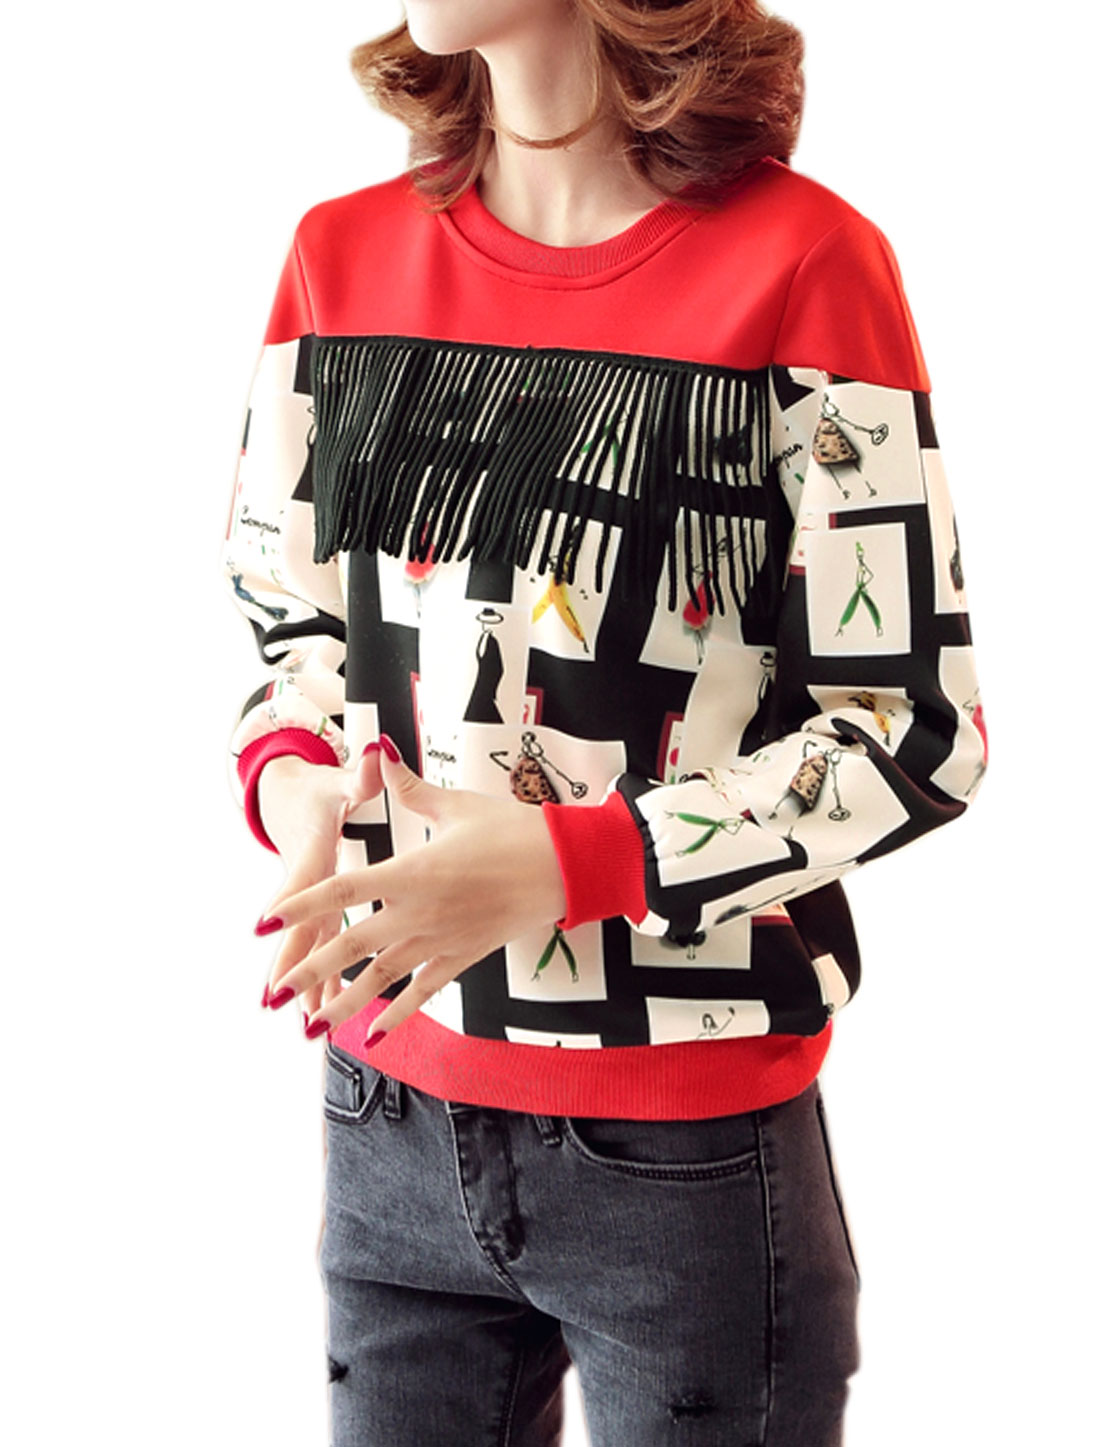 Women Crew Neck Long Sleeves Tassels Front Portrait Sweatshirt Red S